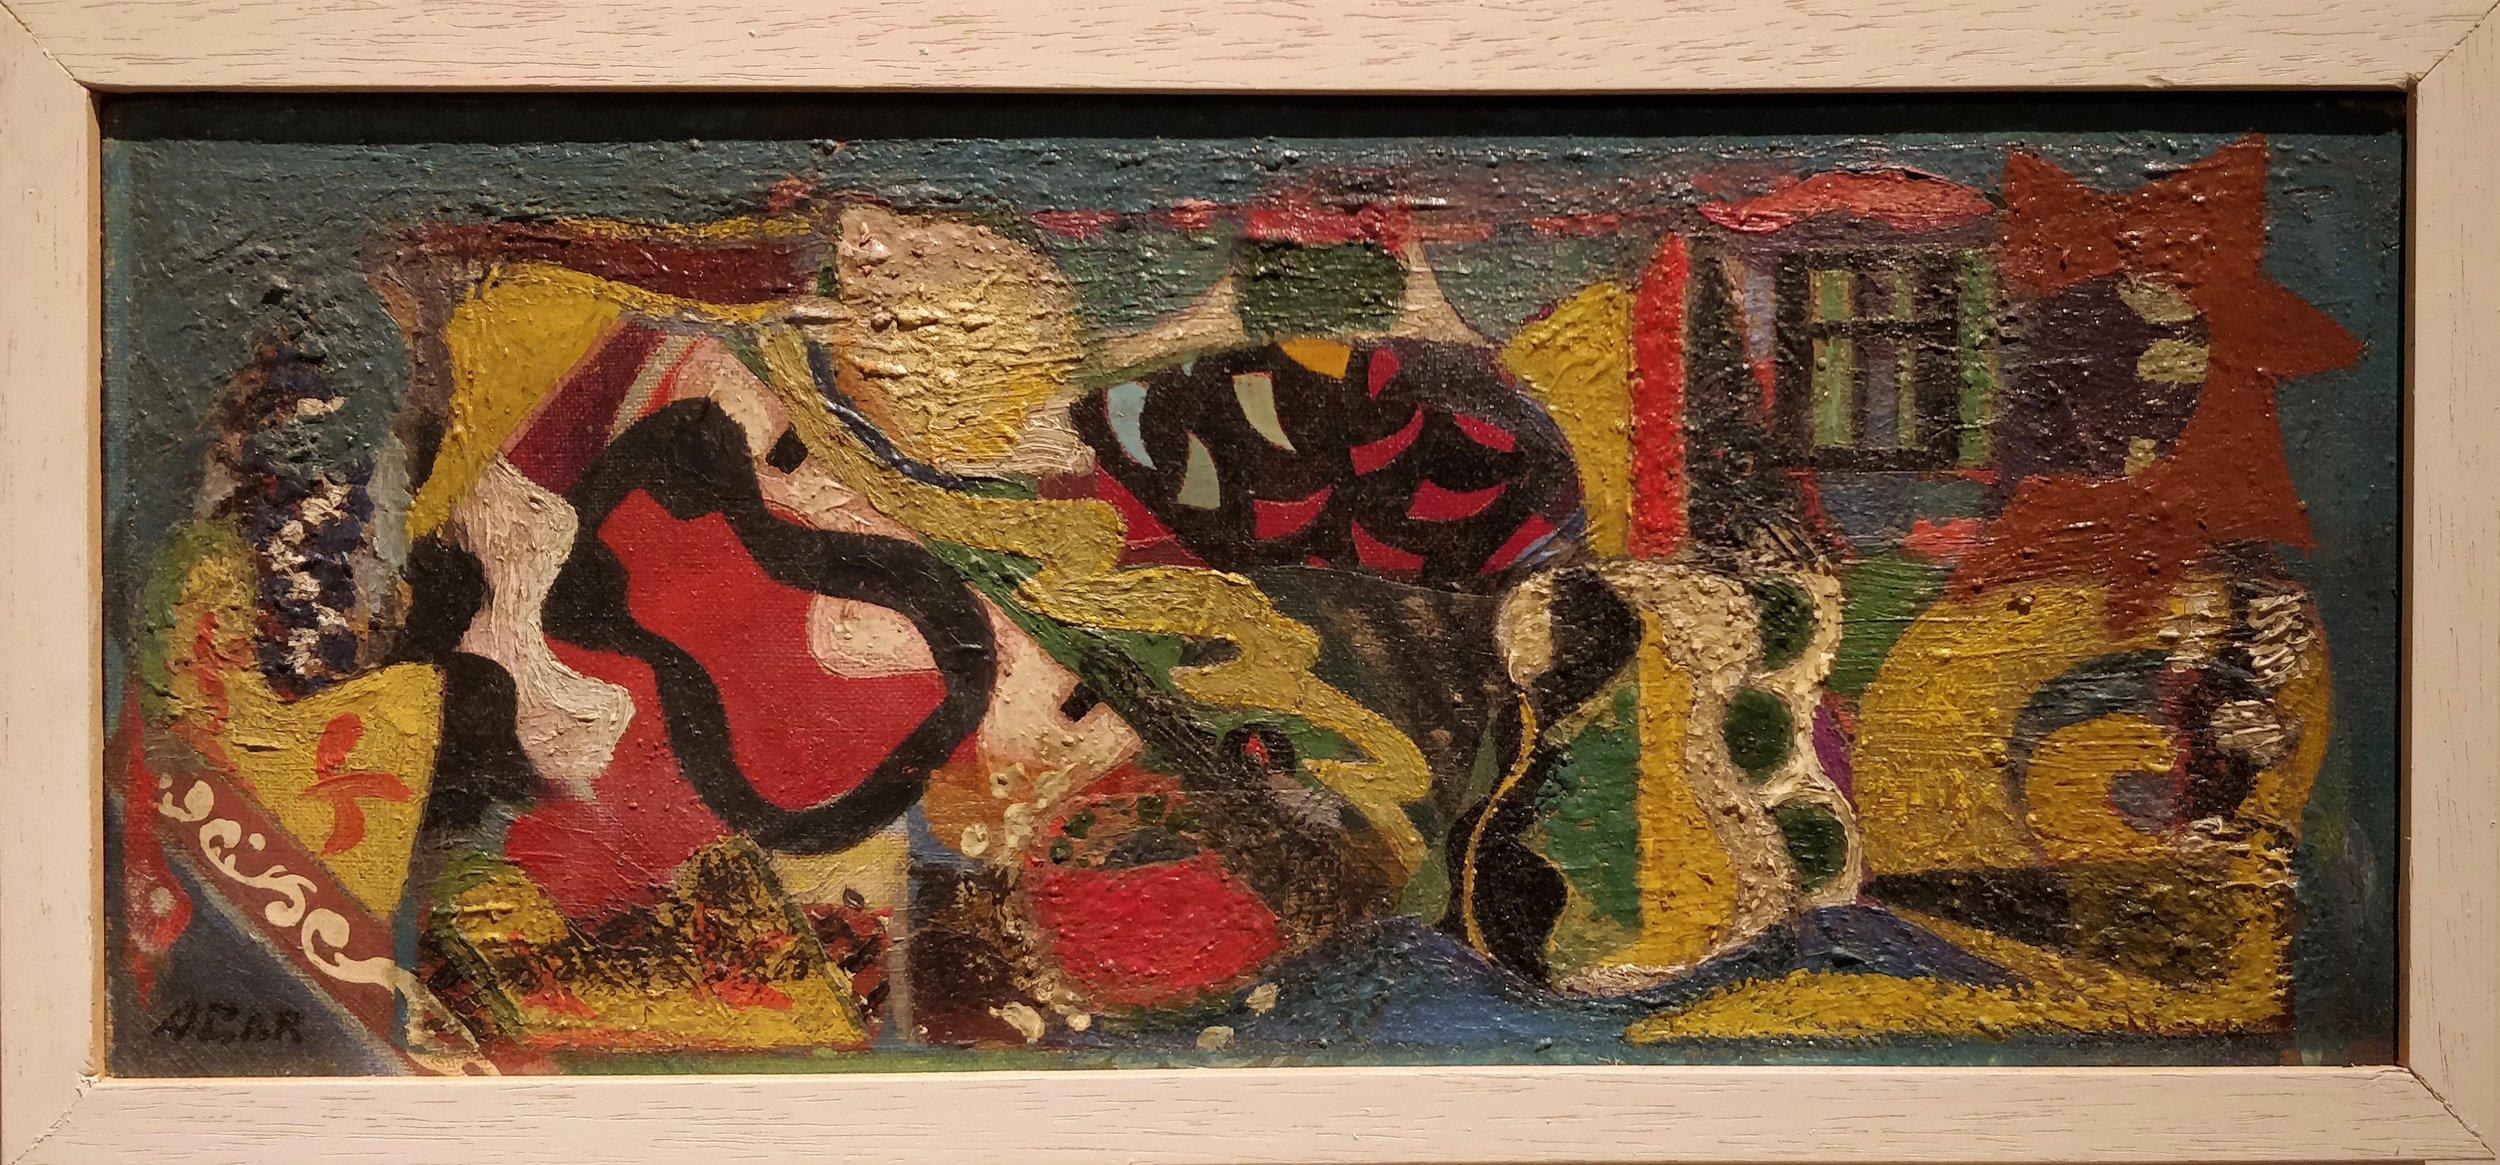 Eileen Agar, Np. 18 Musical Garden, 1947. Oil on Canvas